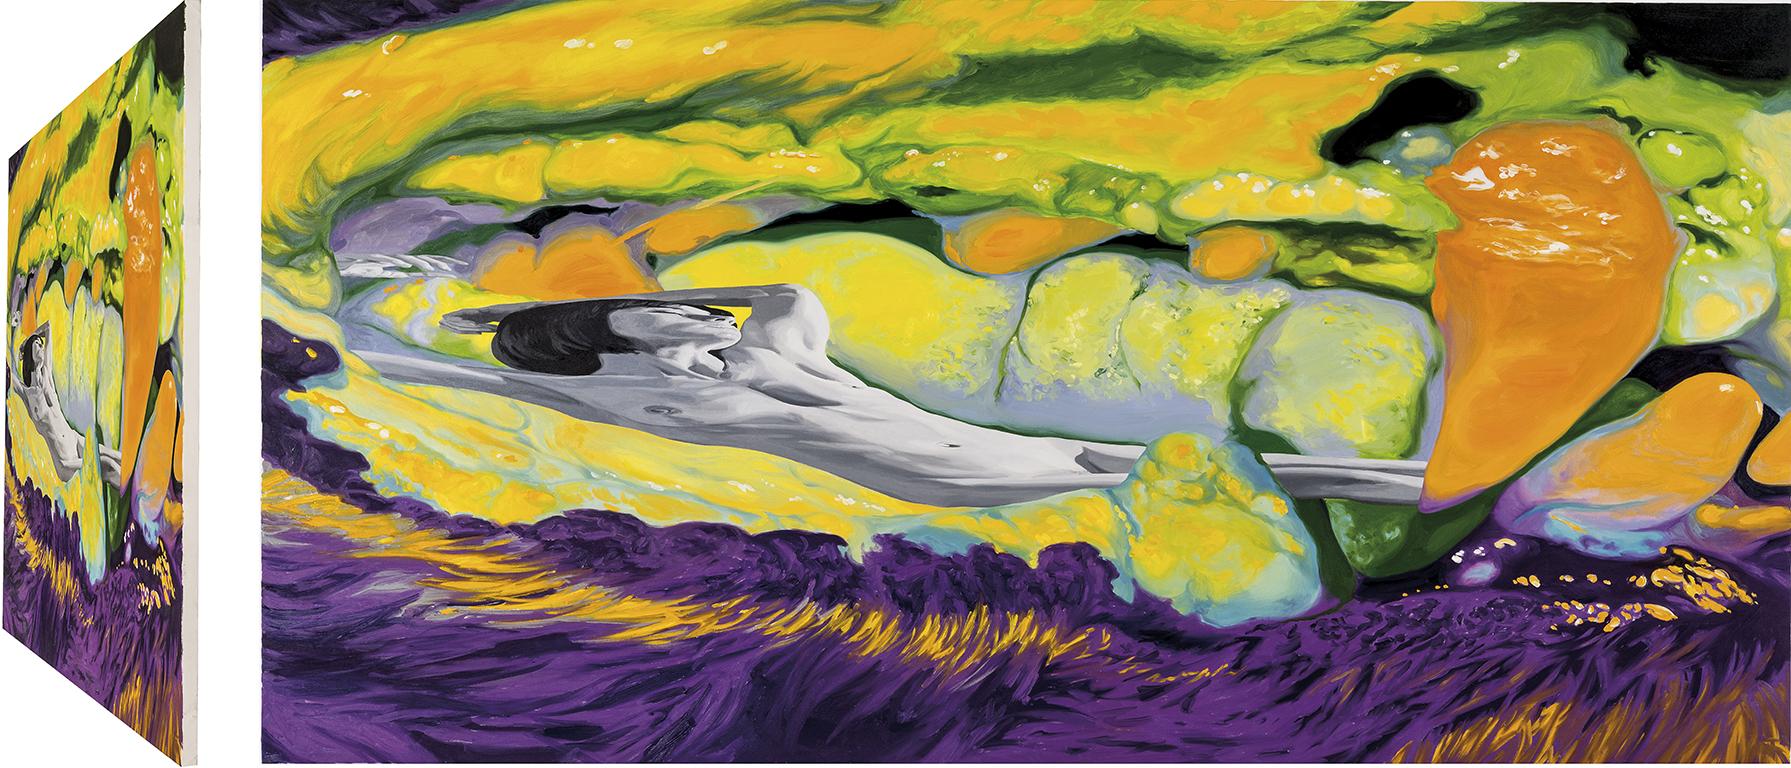 Endimión. Óleo sobre lienzo. 90 x 180 cm.